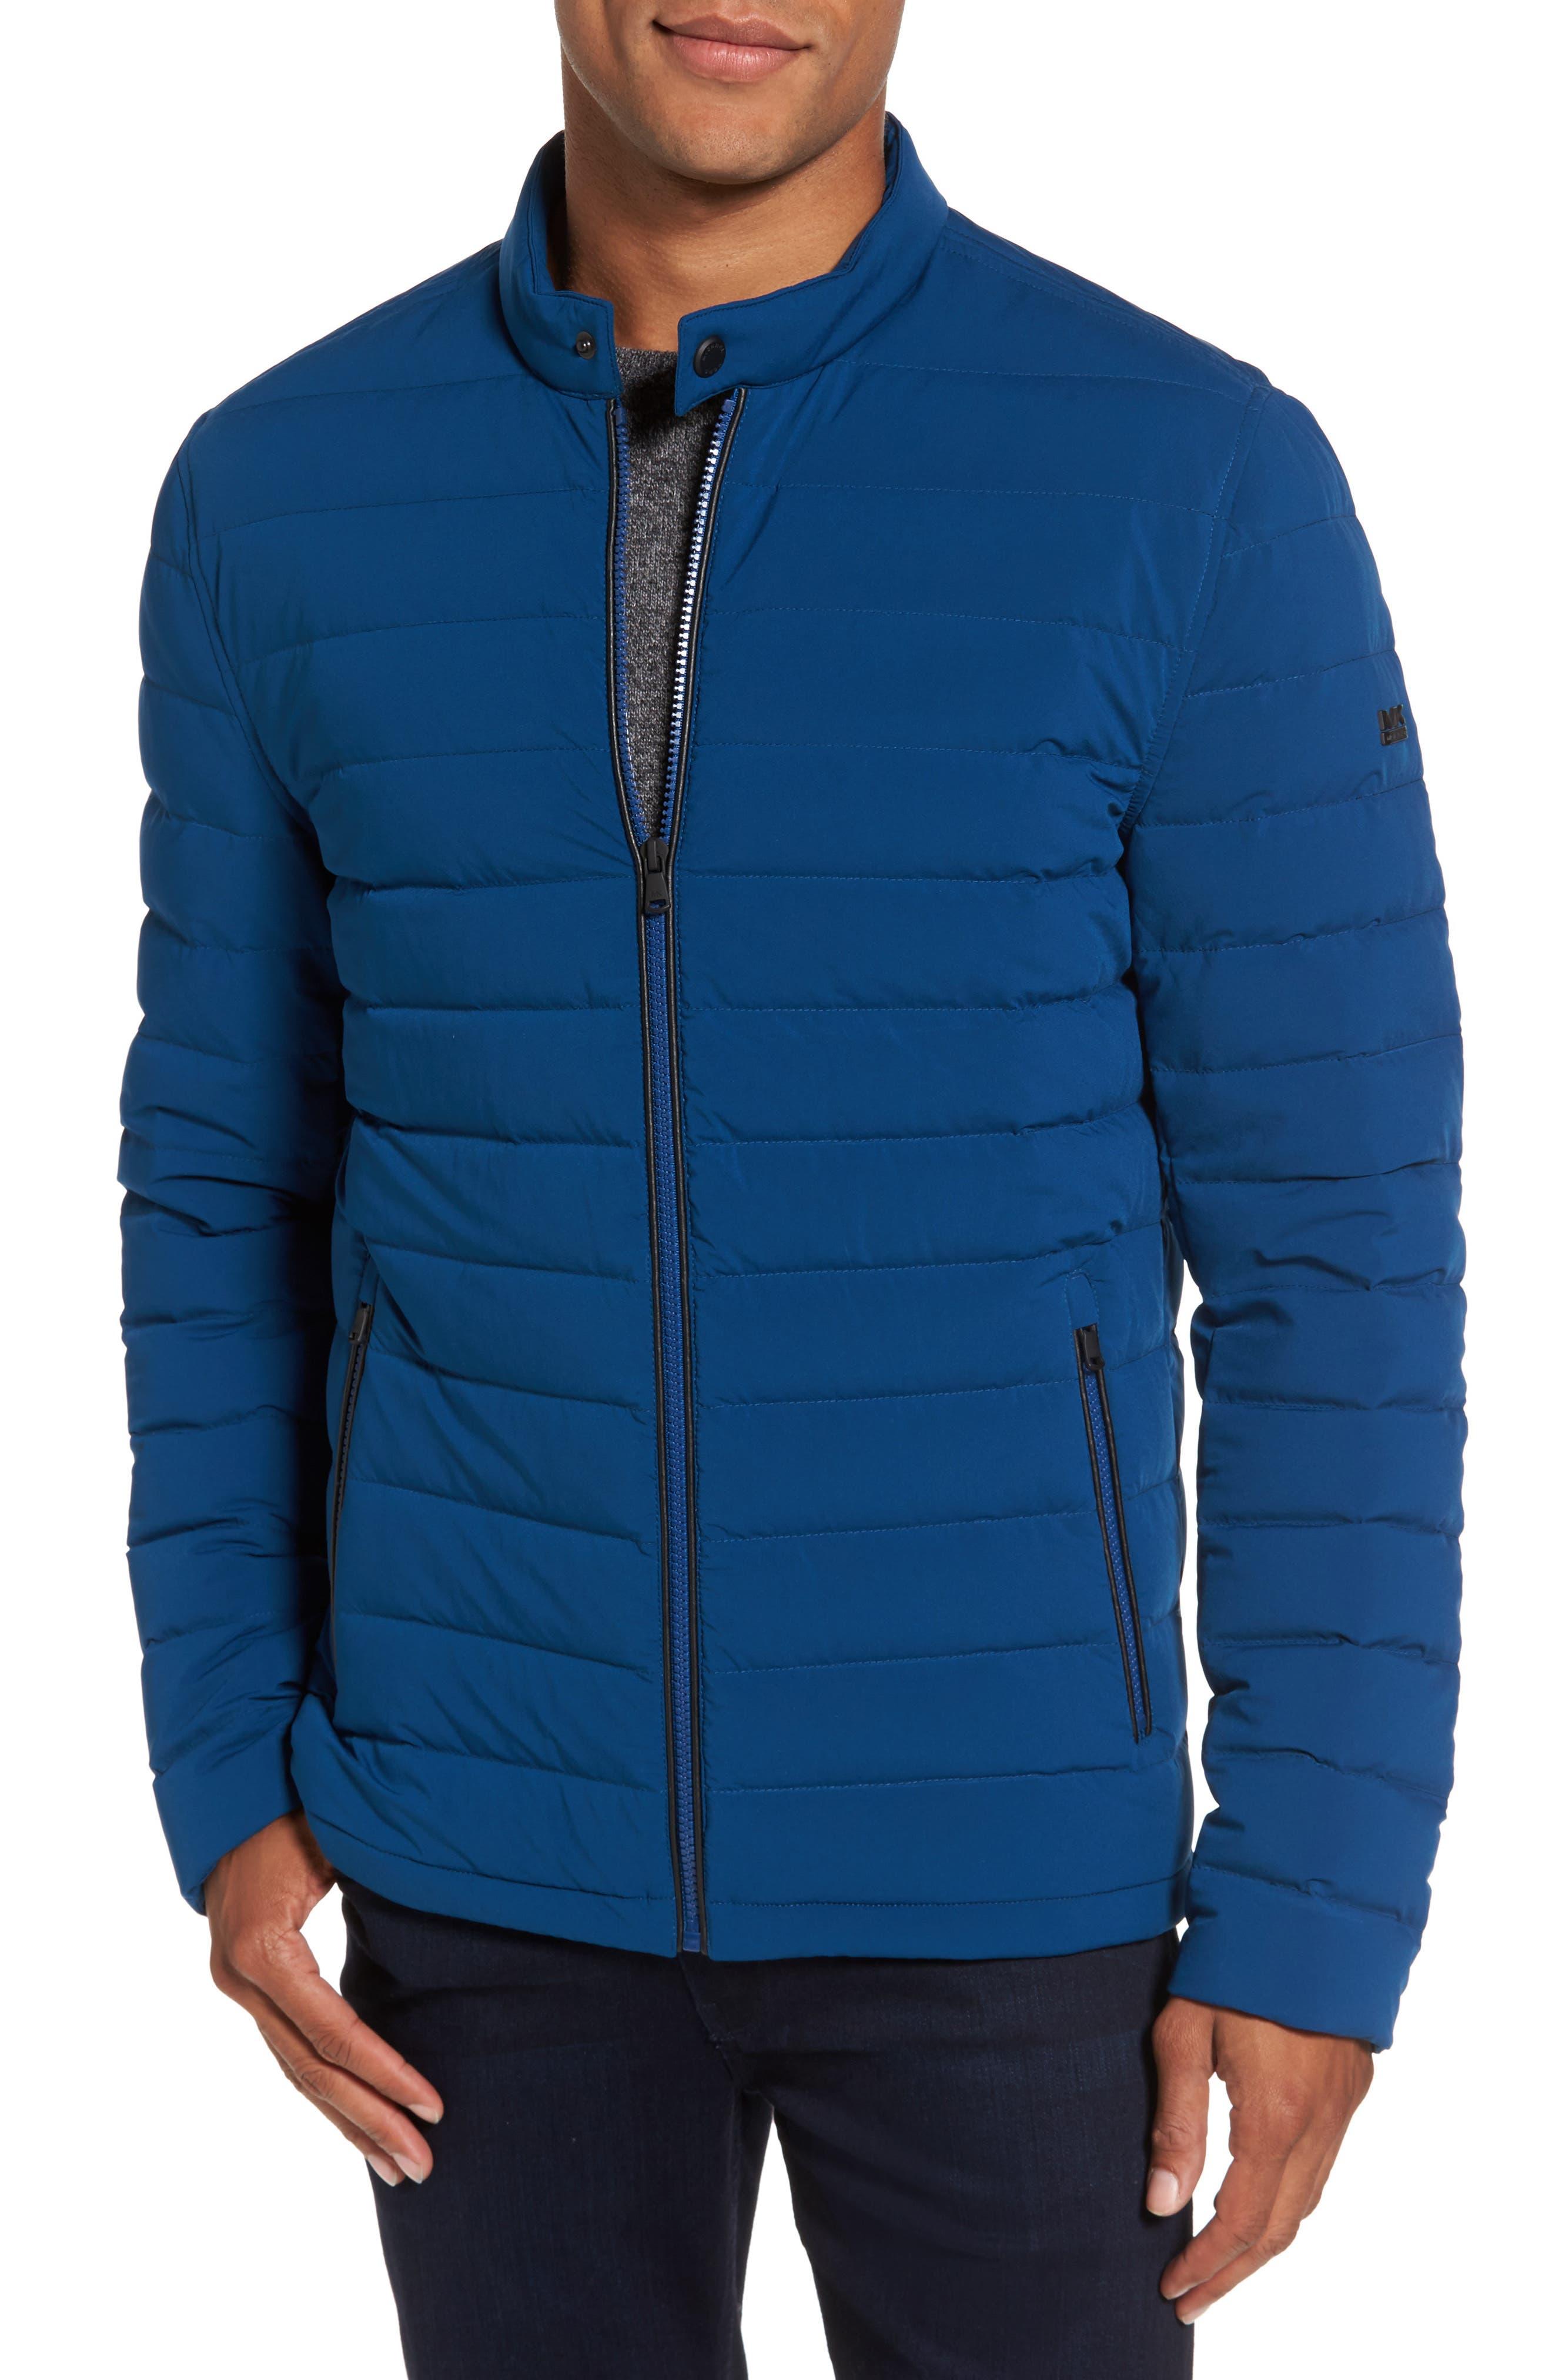 Main Image - Michael Kors Packable Stretch Down Jacket